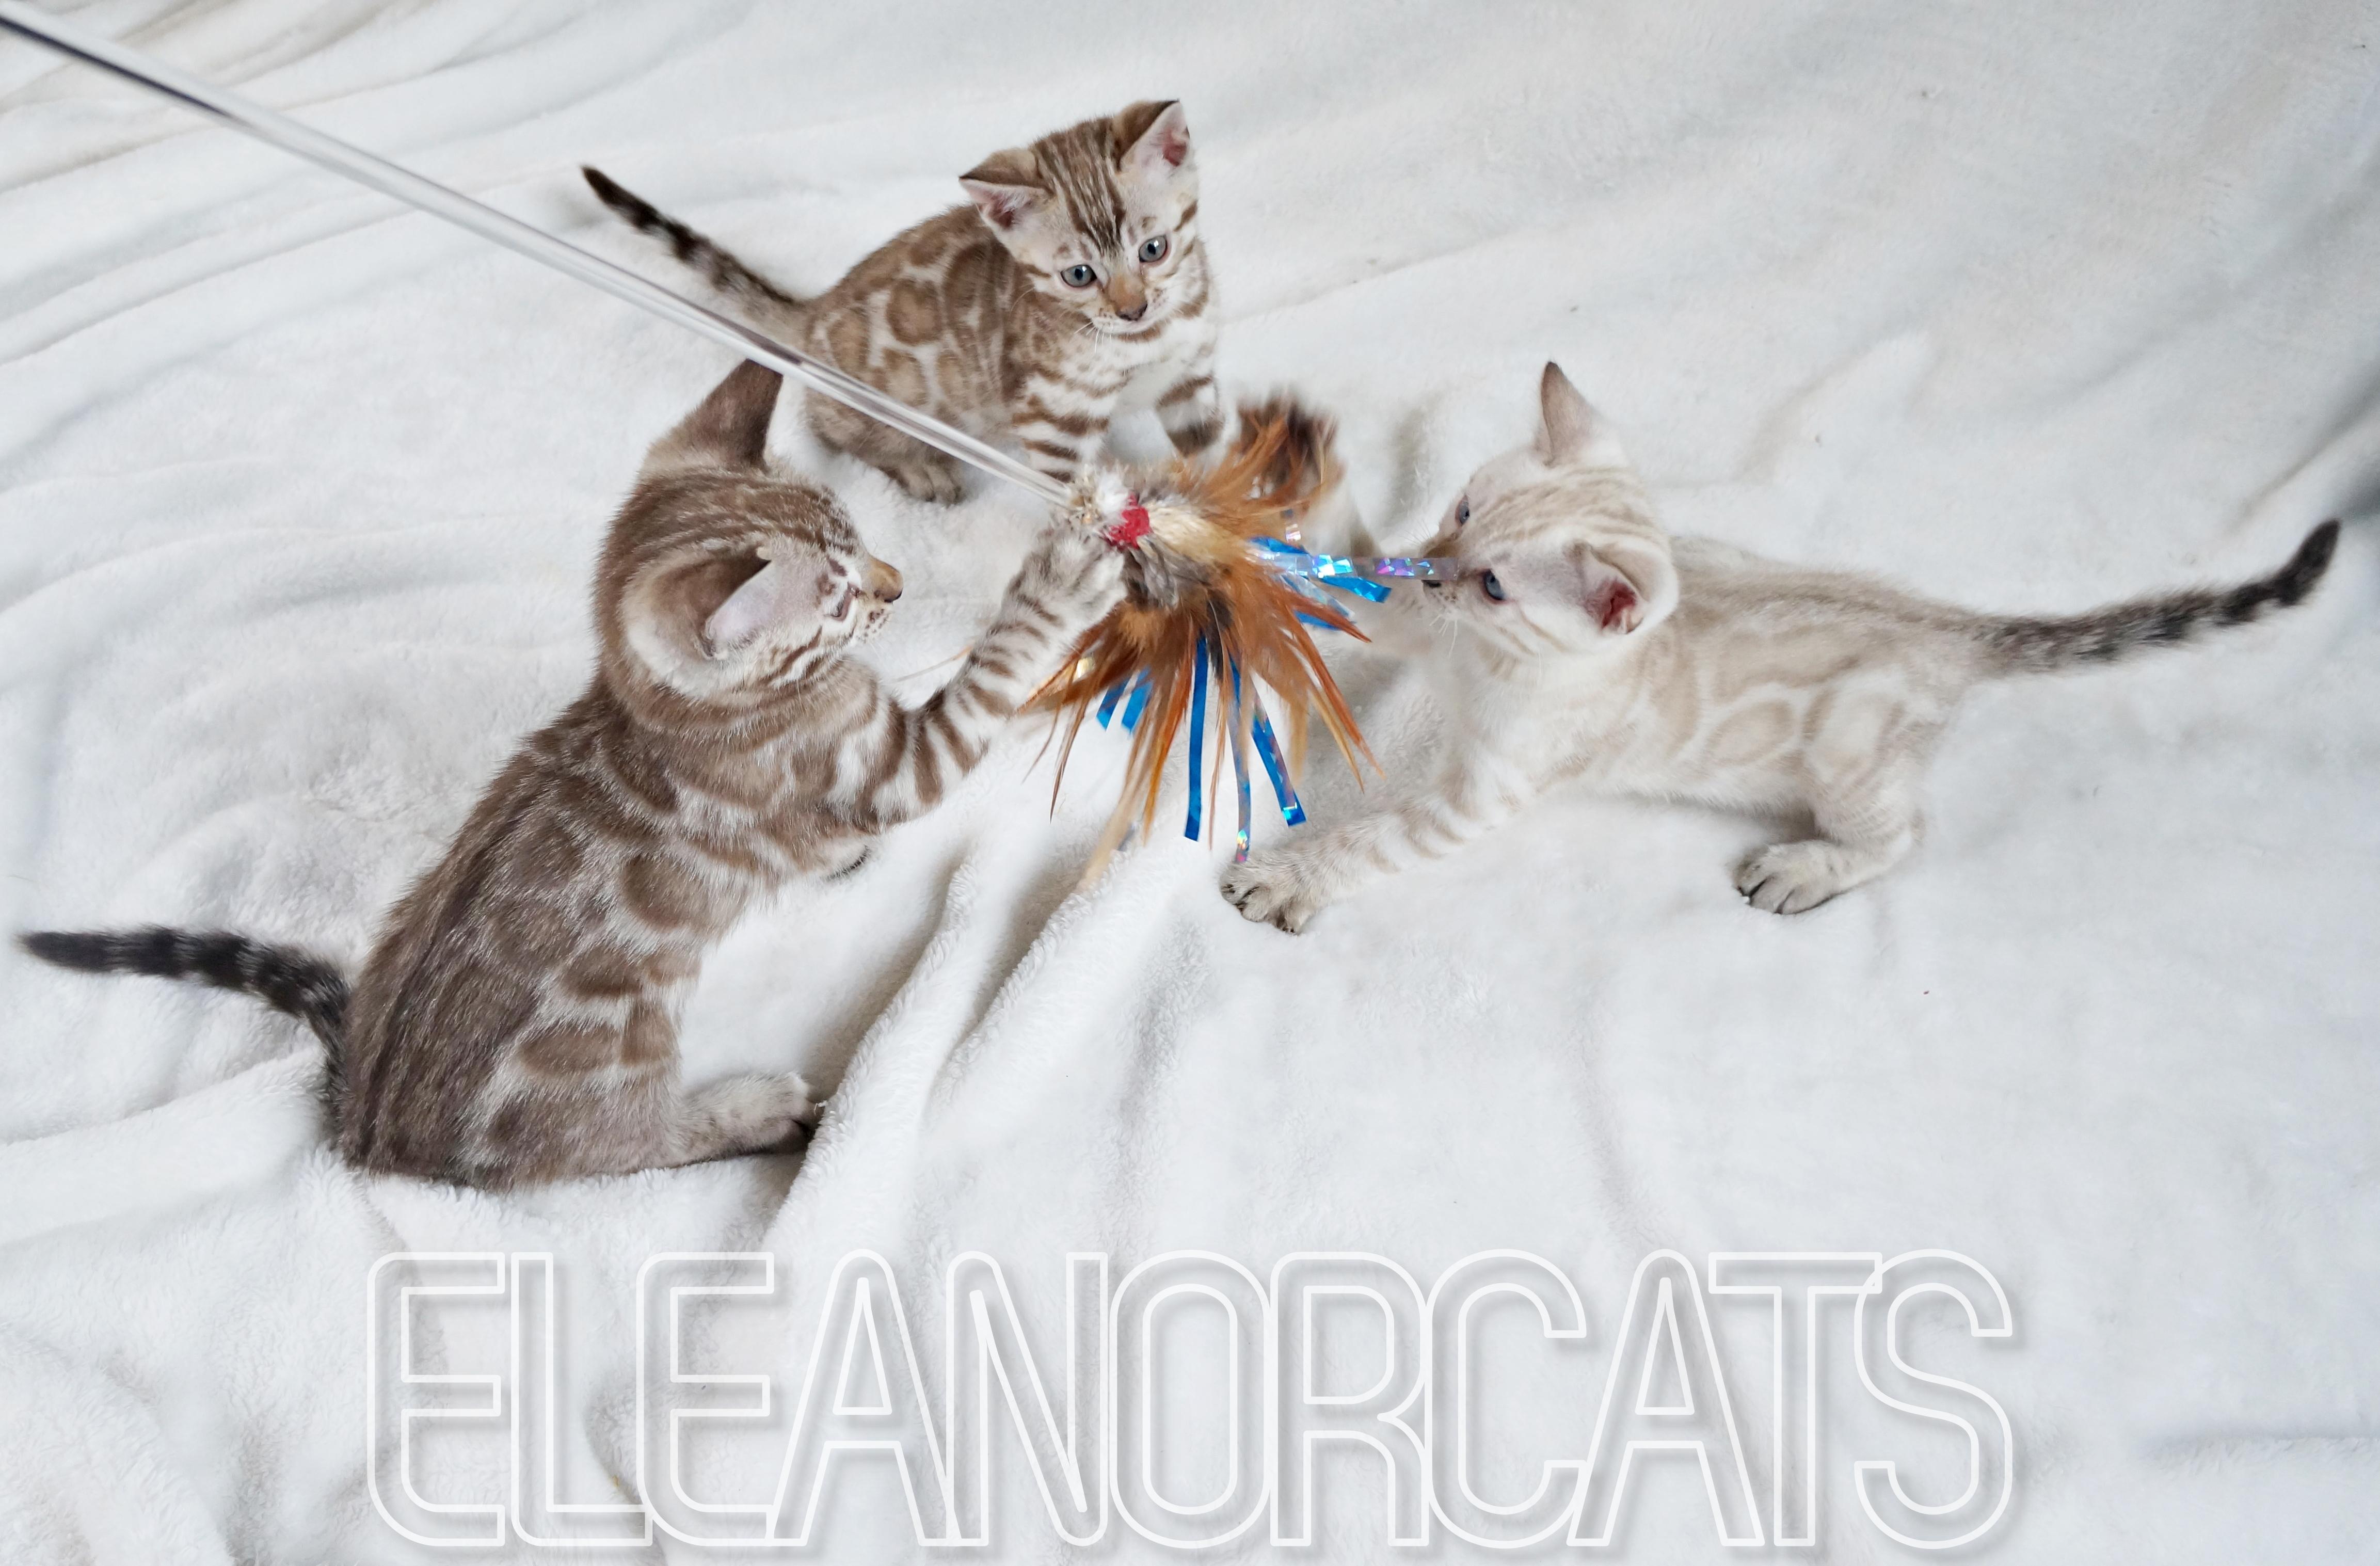 Trio de chatons, bb Diamond bengal eleanorcats